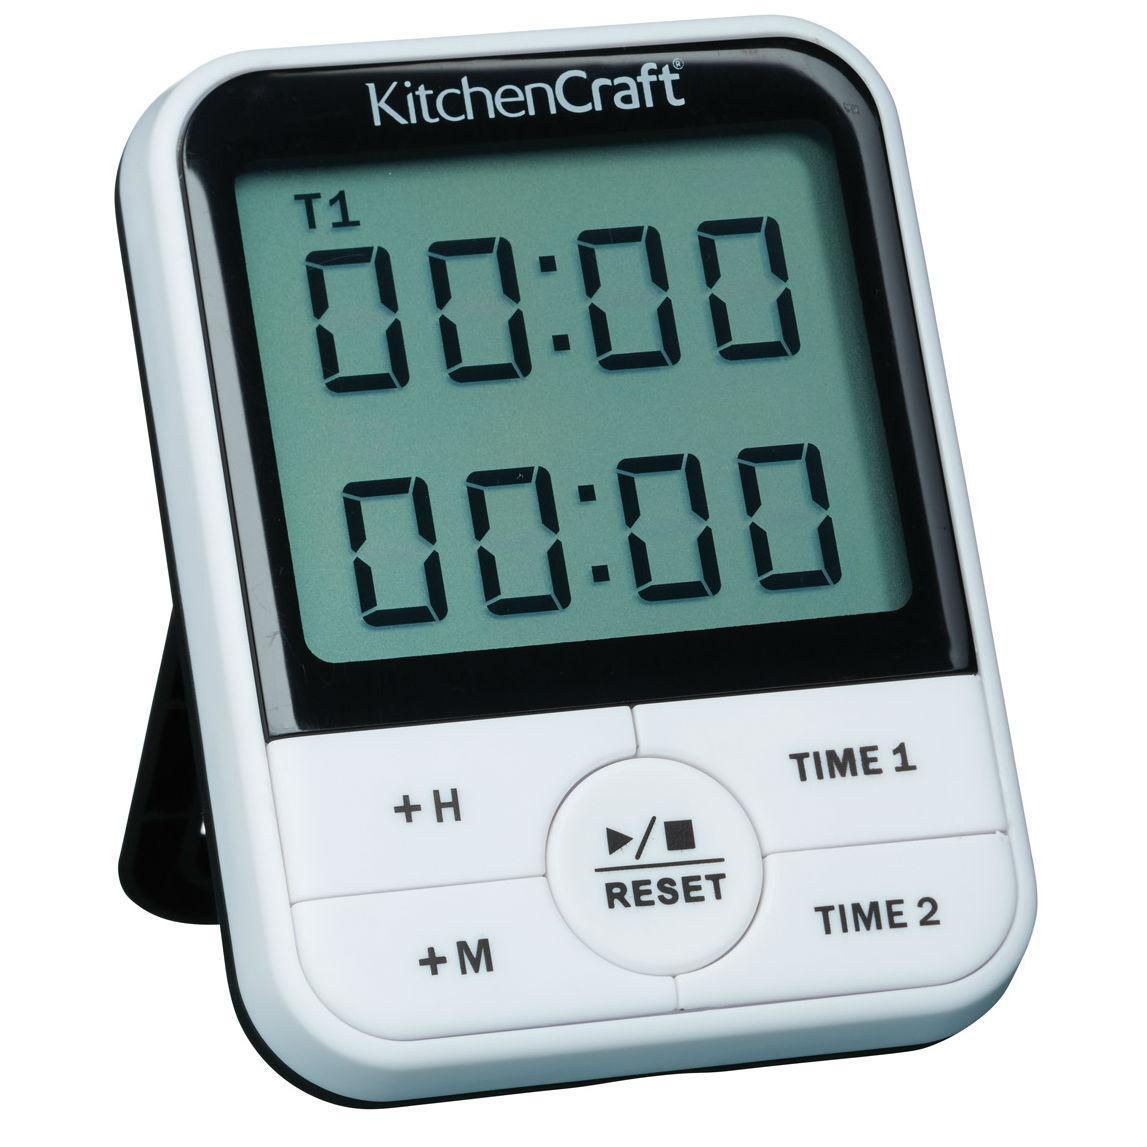 KitchenCraft 24-Hour Dual Event Digital Kitchen Timer: Amazon.co.uk ...